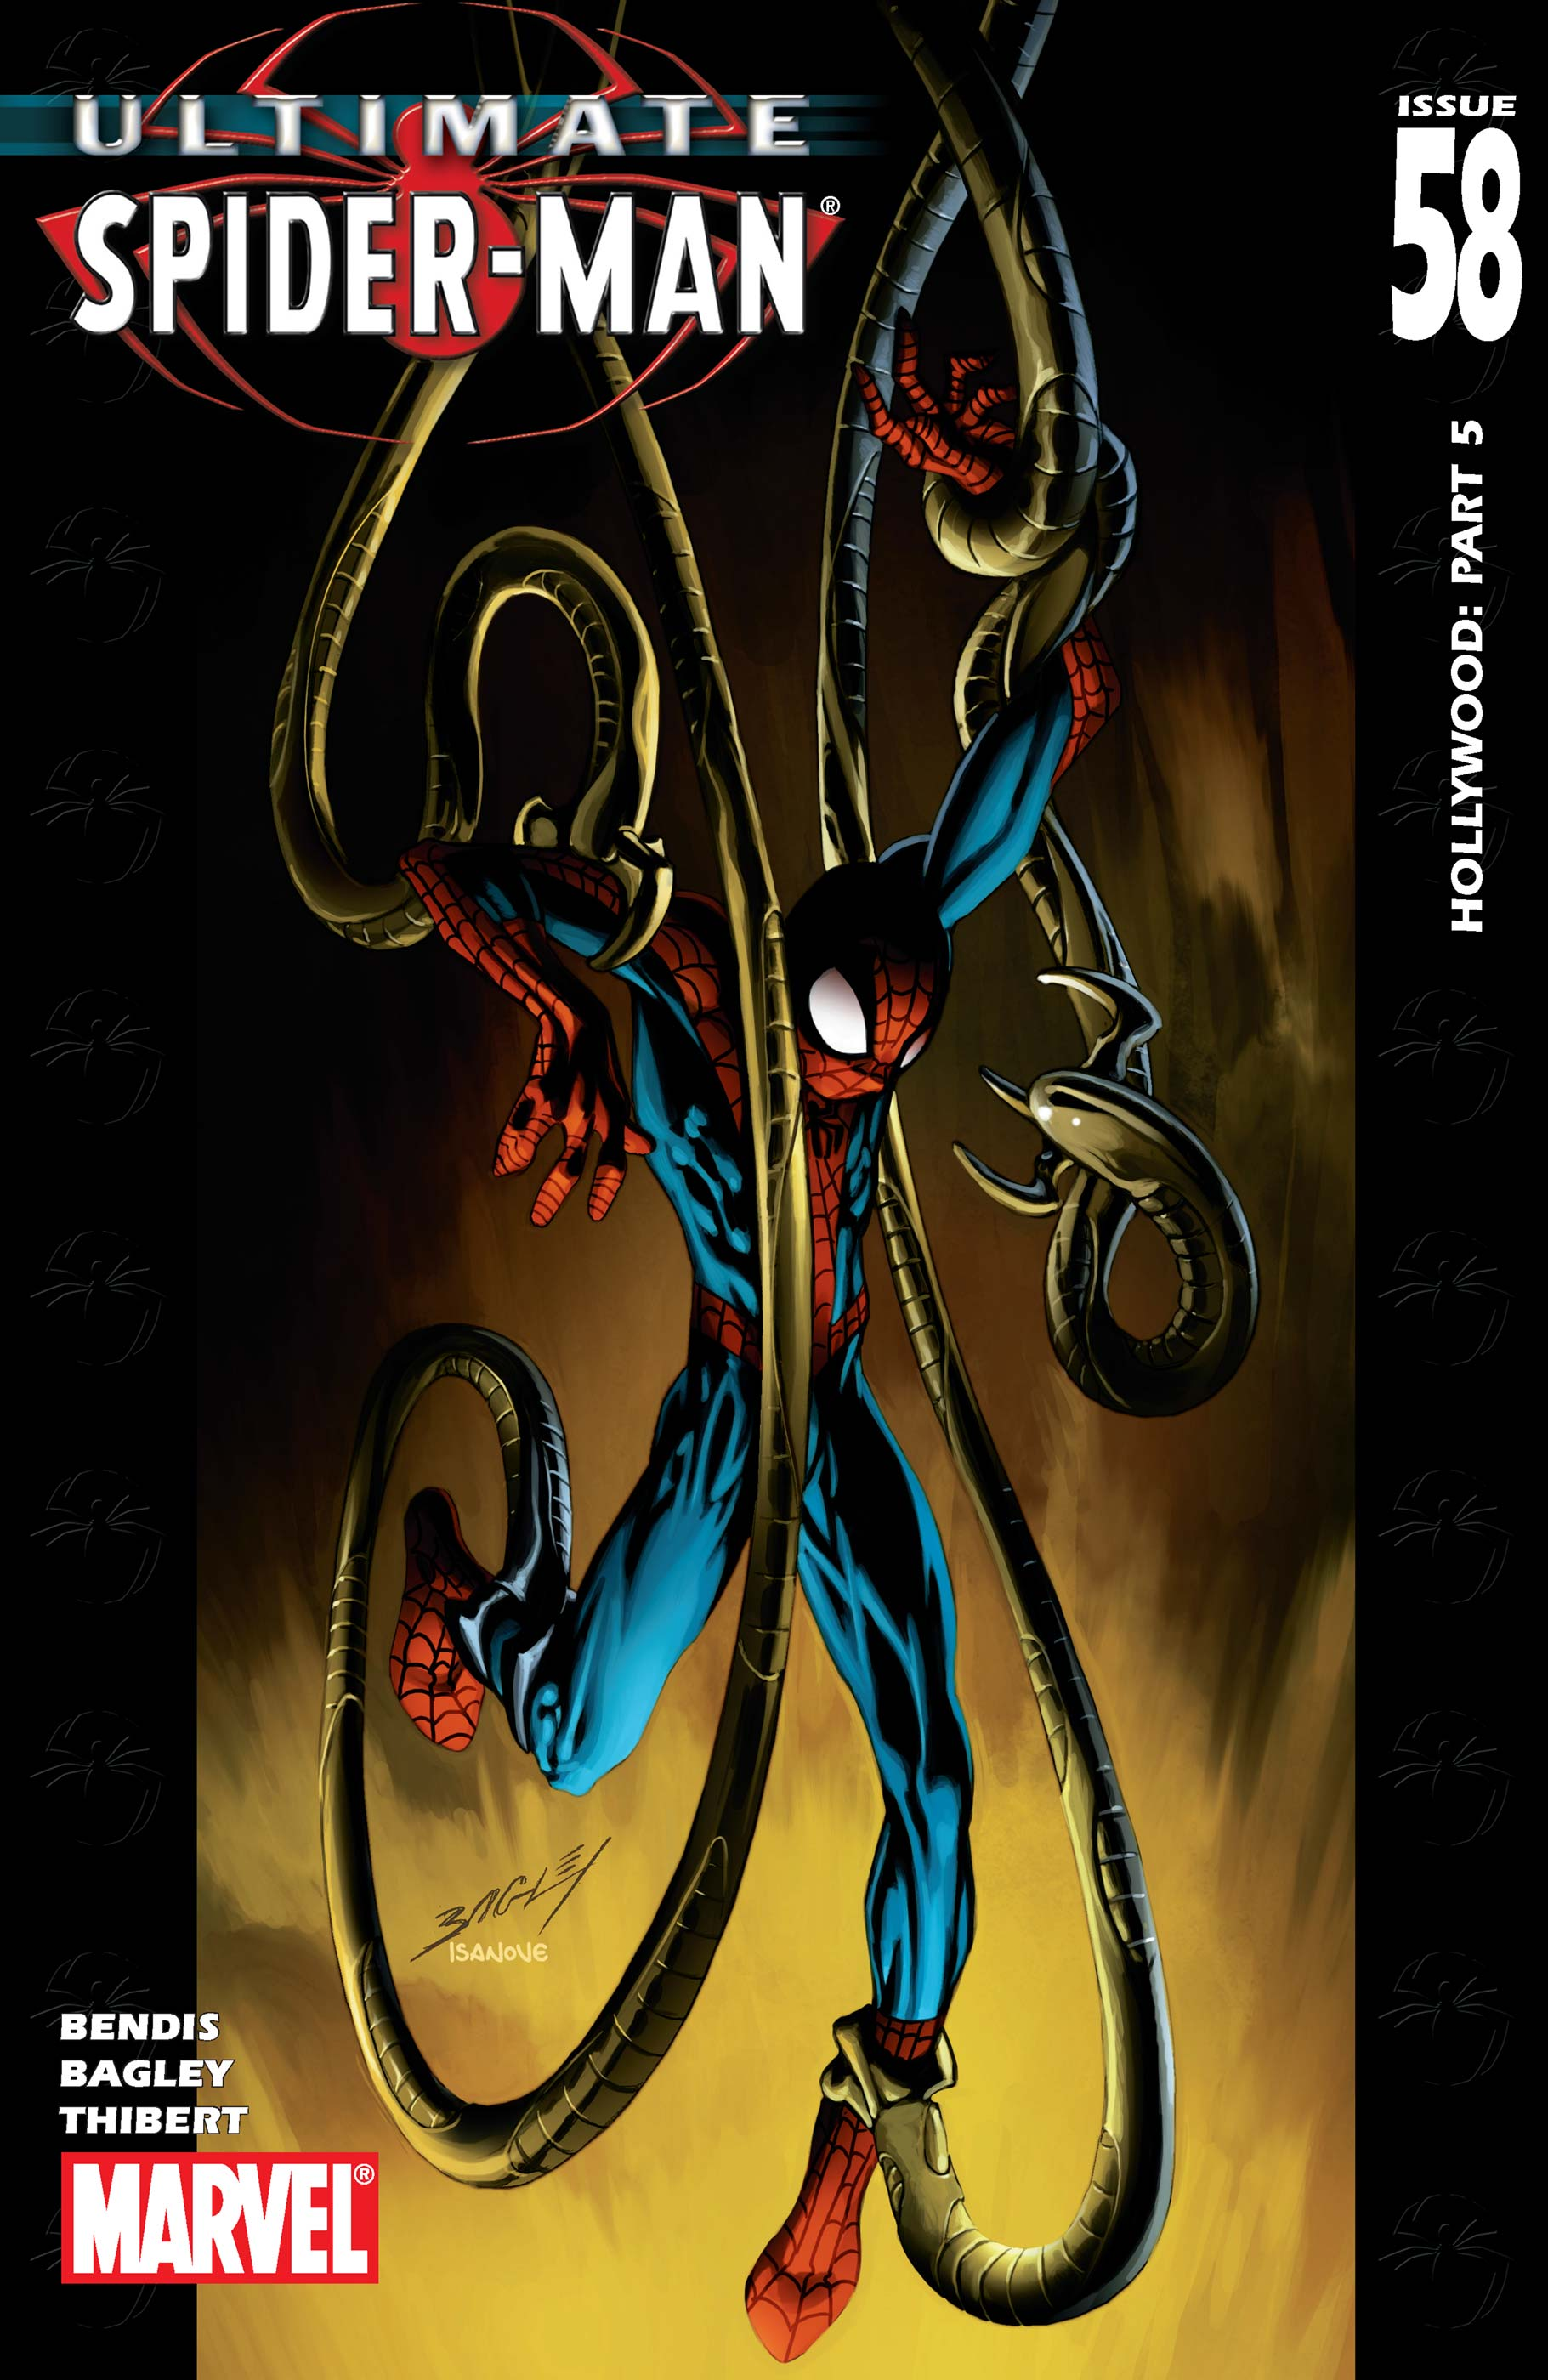 Ultimate Spider-Man (2000) #58